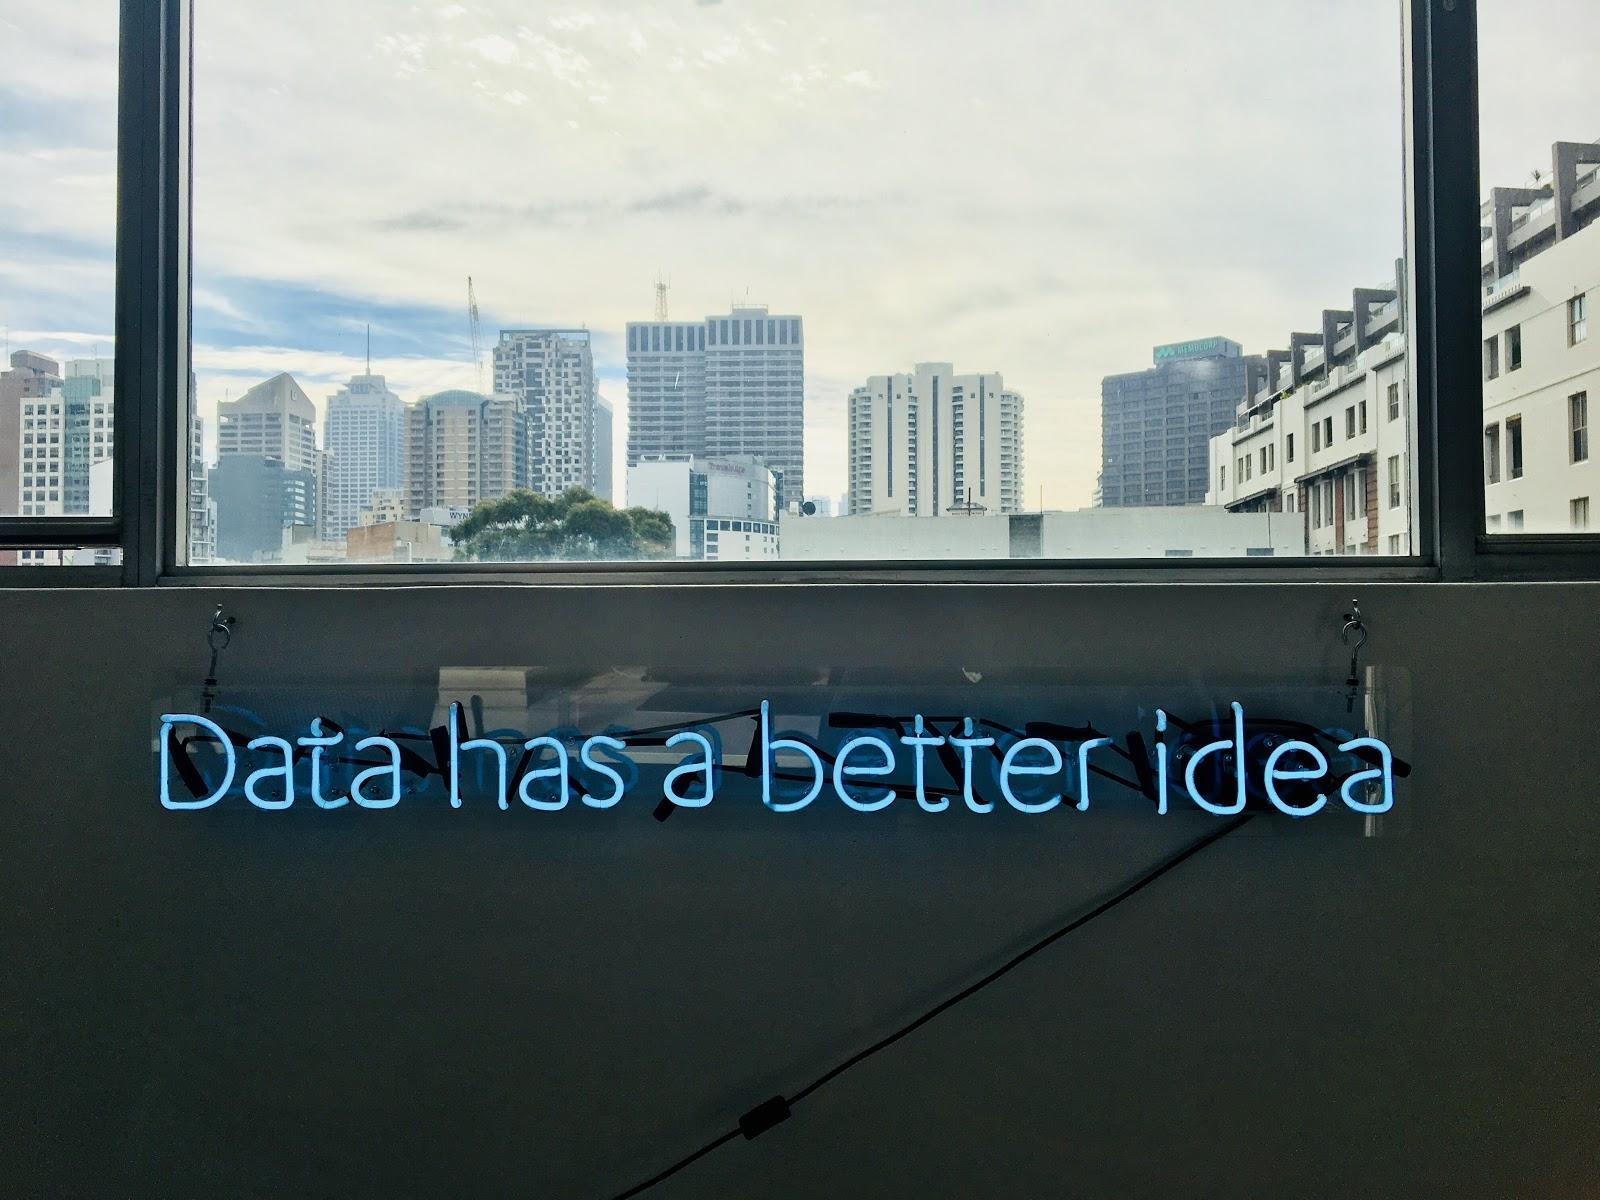 Data has a better idea graphic